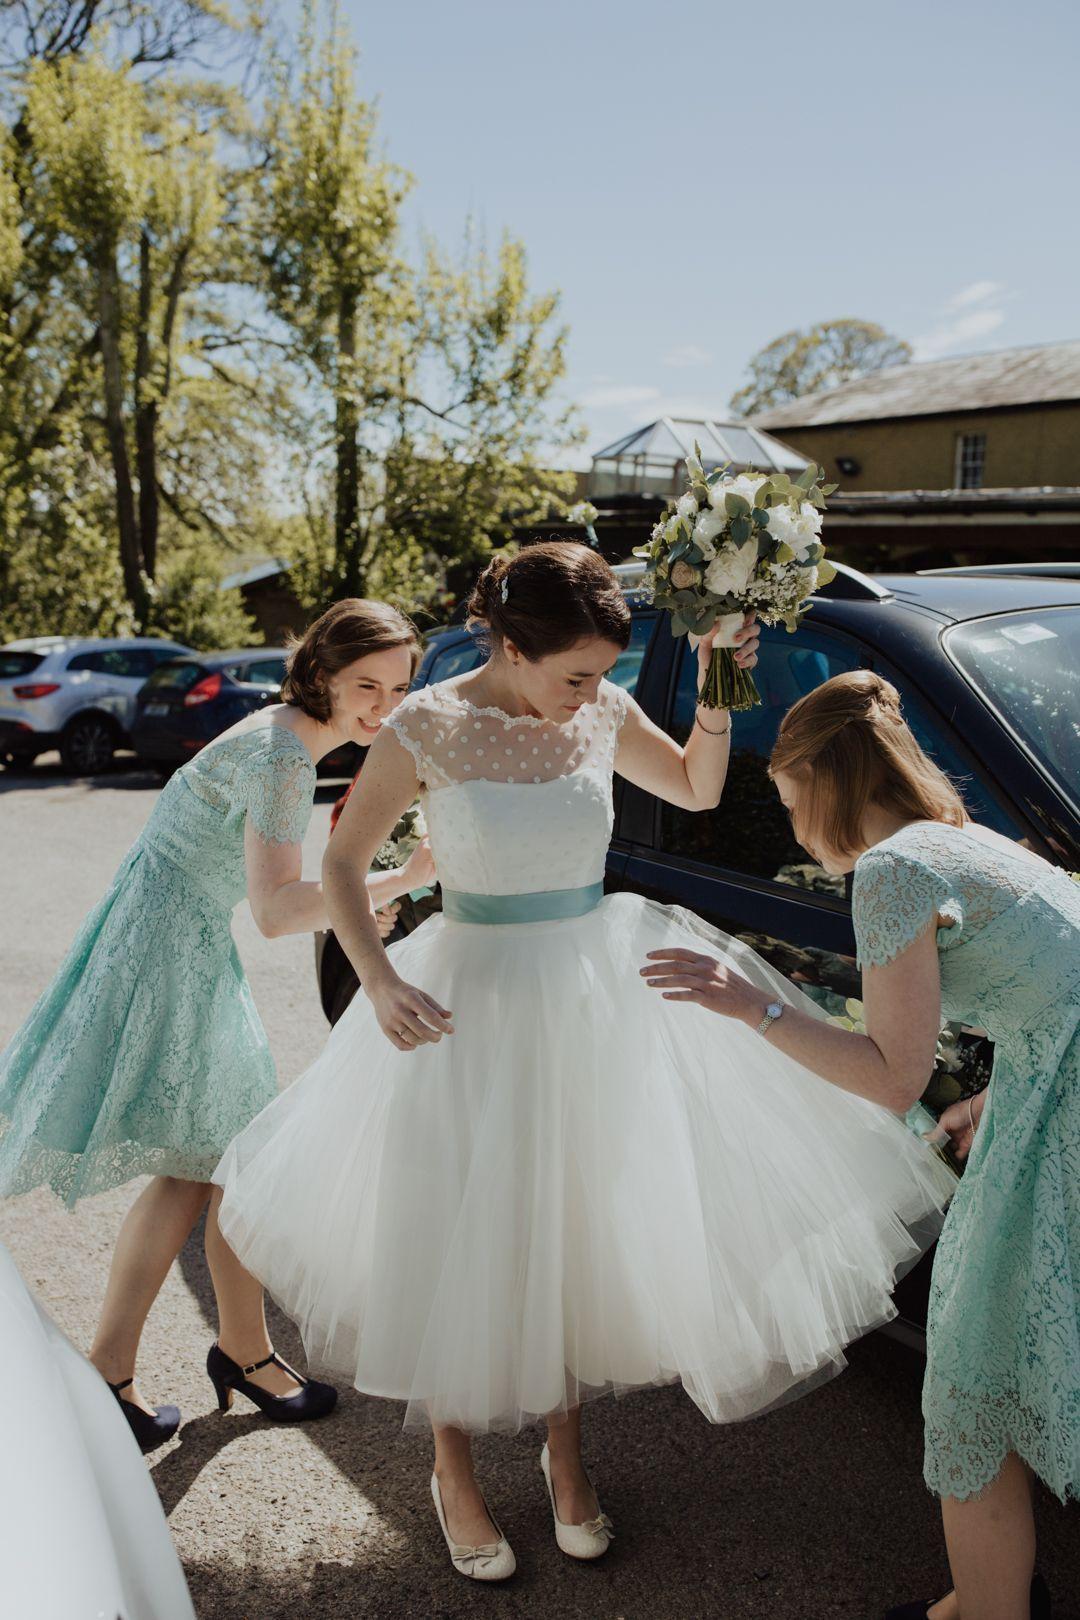 Mint Green Bridesmaids Weddingdresspictures Short Wedding Dress Vintage Tea Length Wedding Dress Short Wedding Dress [ 1620 x 1080 Pixel ]